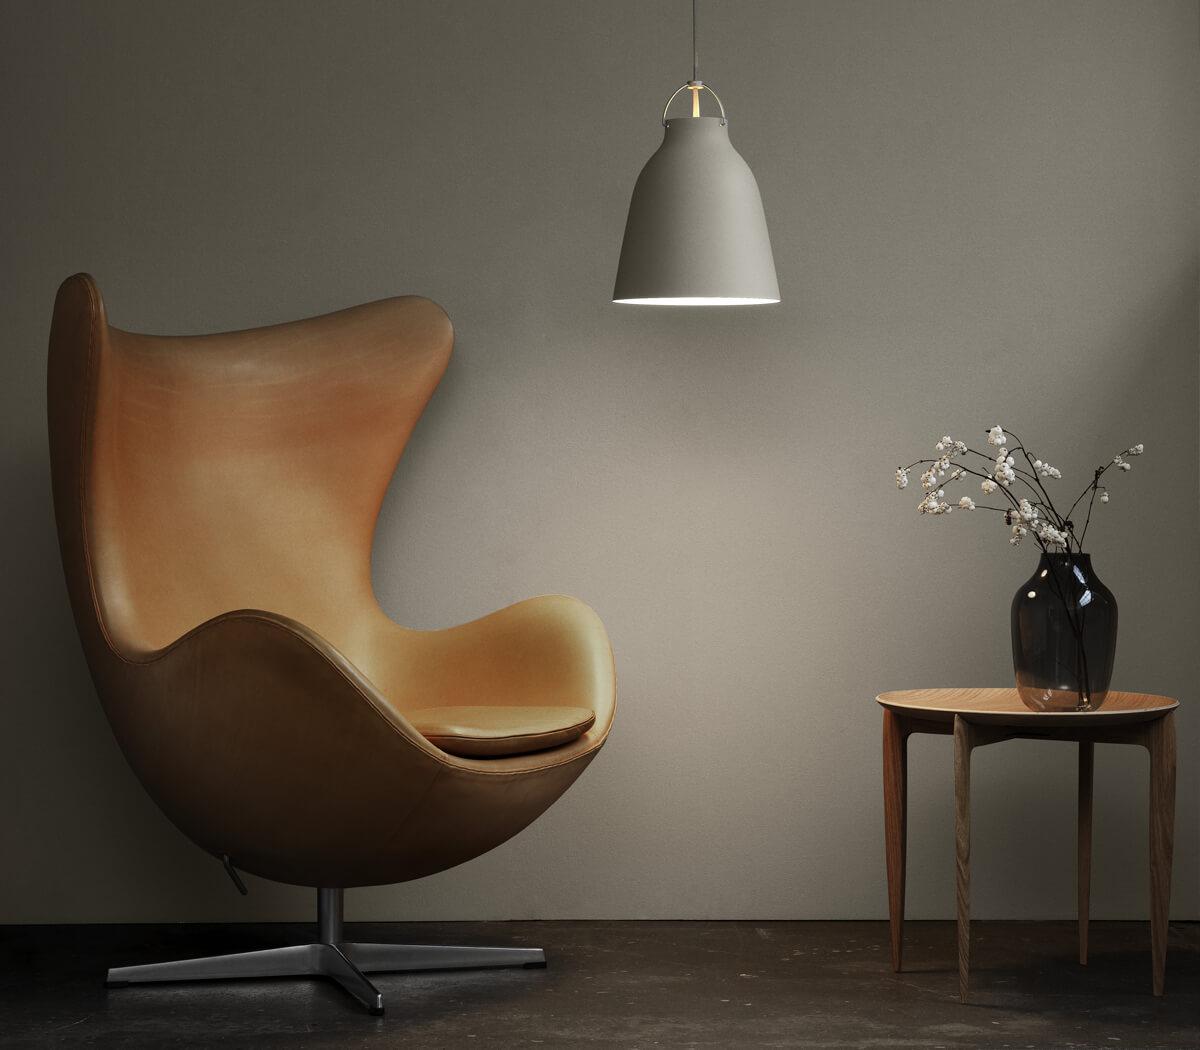 Leather Fritz Hansen Egg Chair and Caravaggio Pendant Light